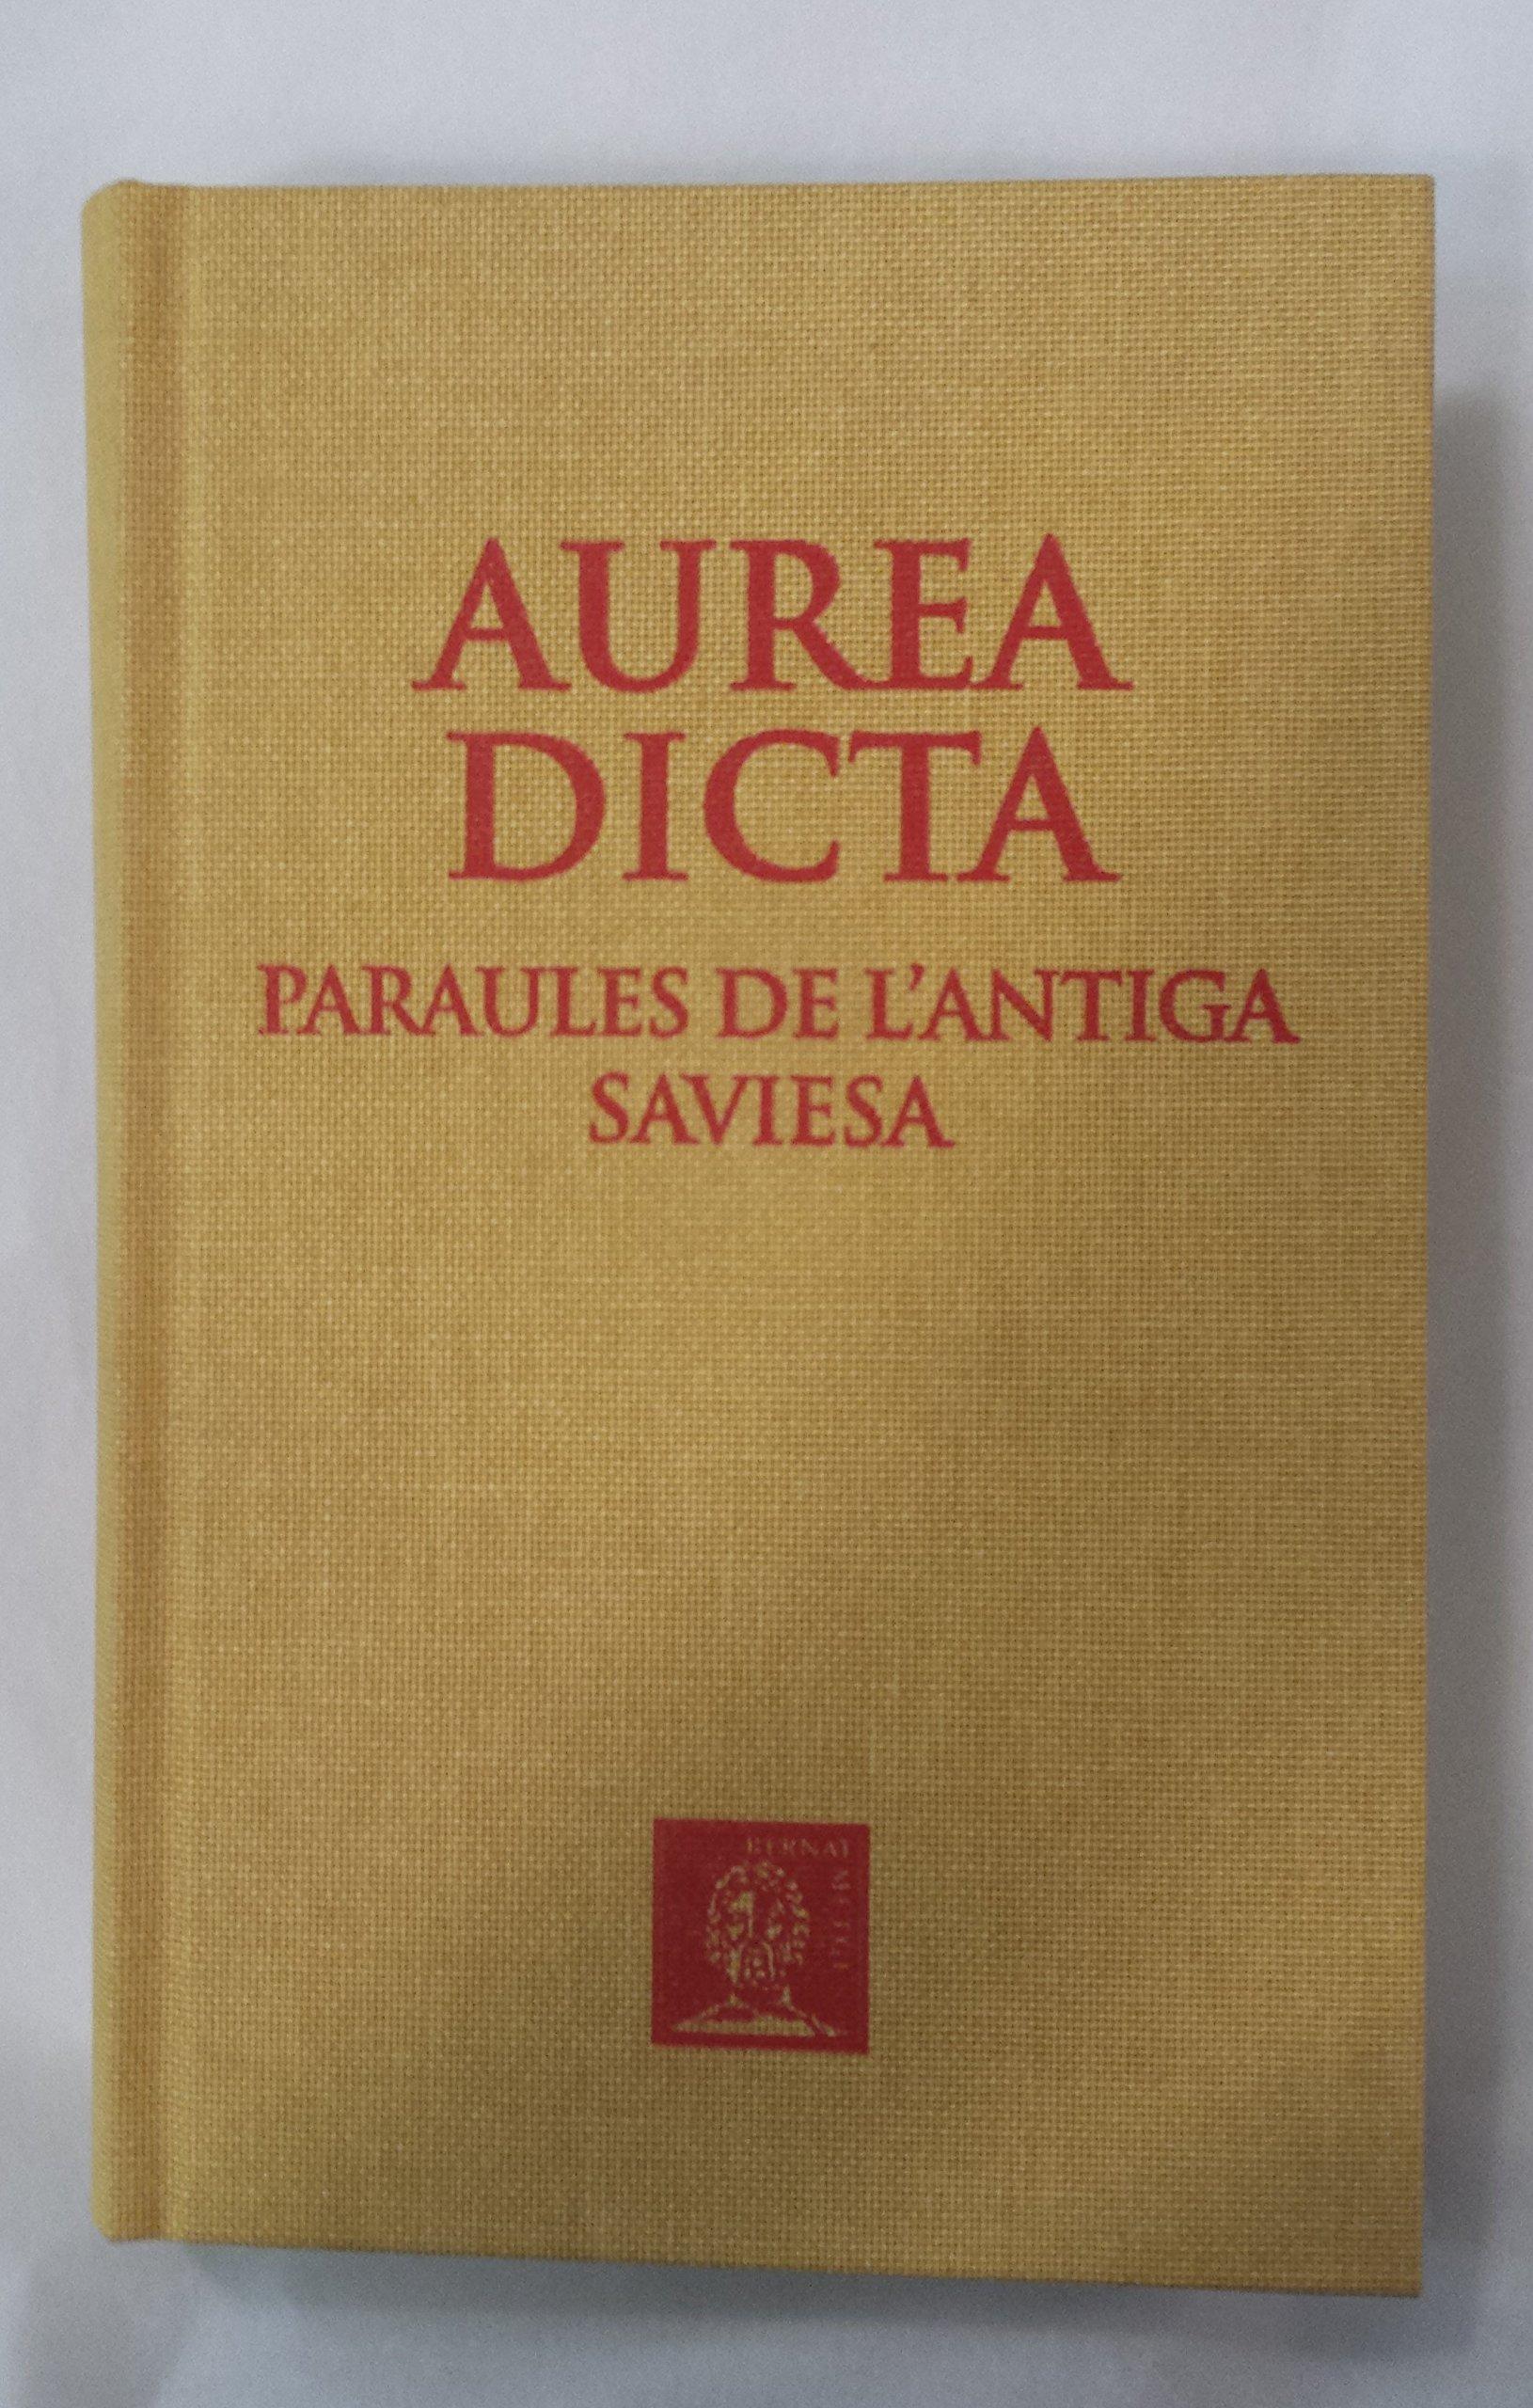 Aurea Dicta